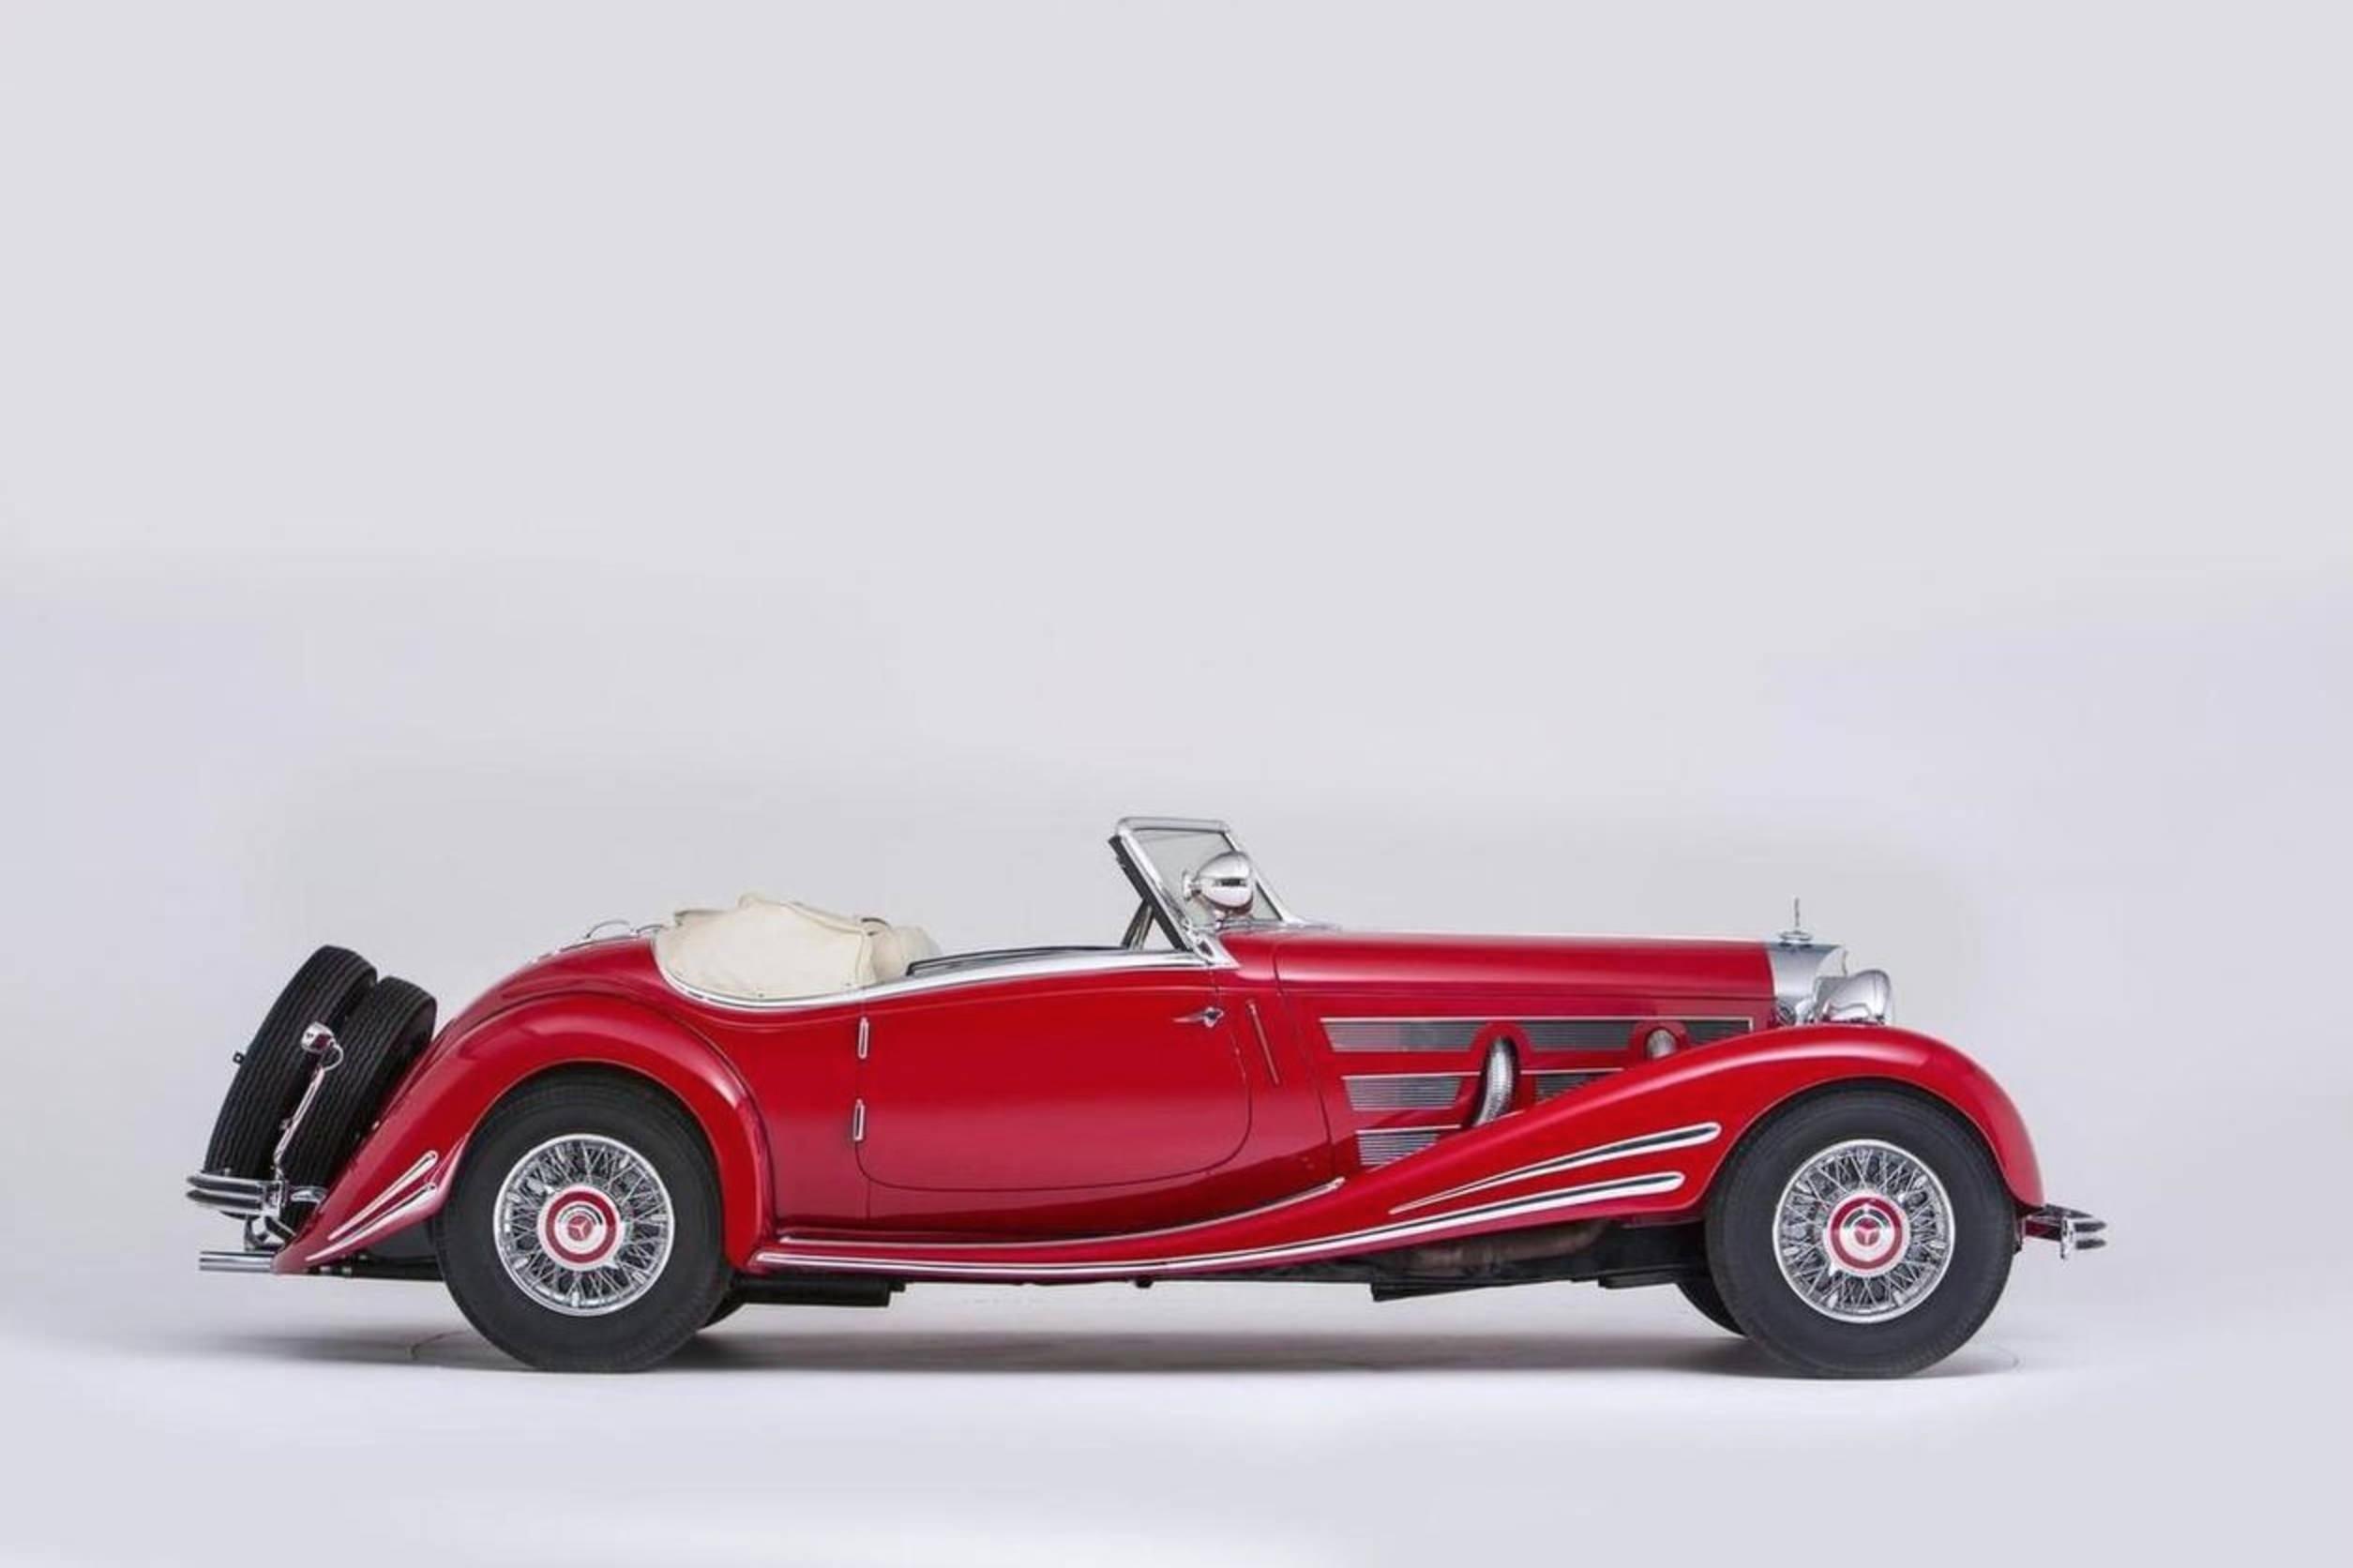 1935 mercedes benz 500 k german classic cars pinterest mercedes benz 500 mercedes benz and cars